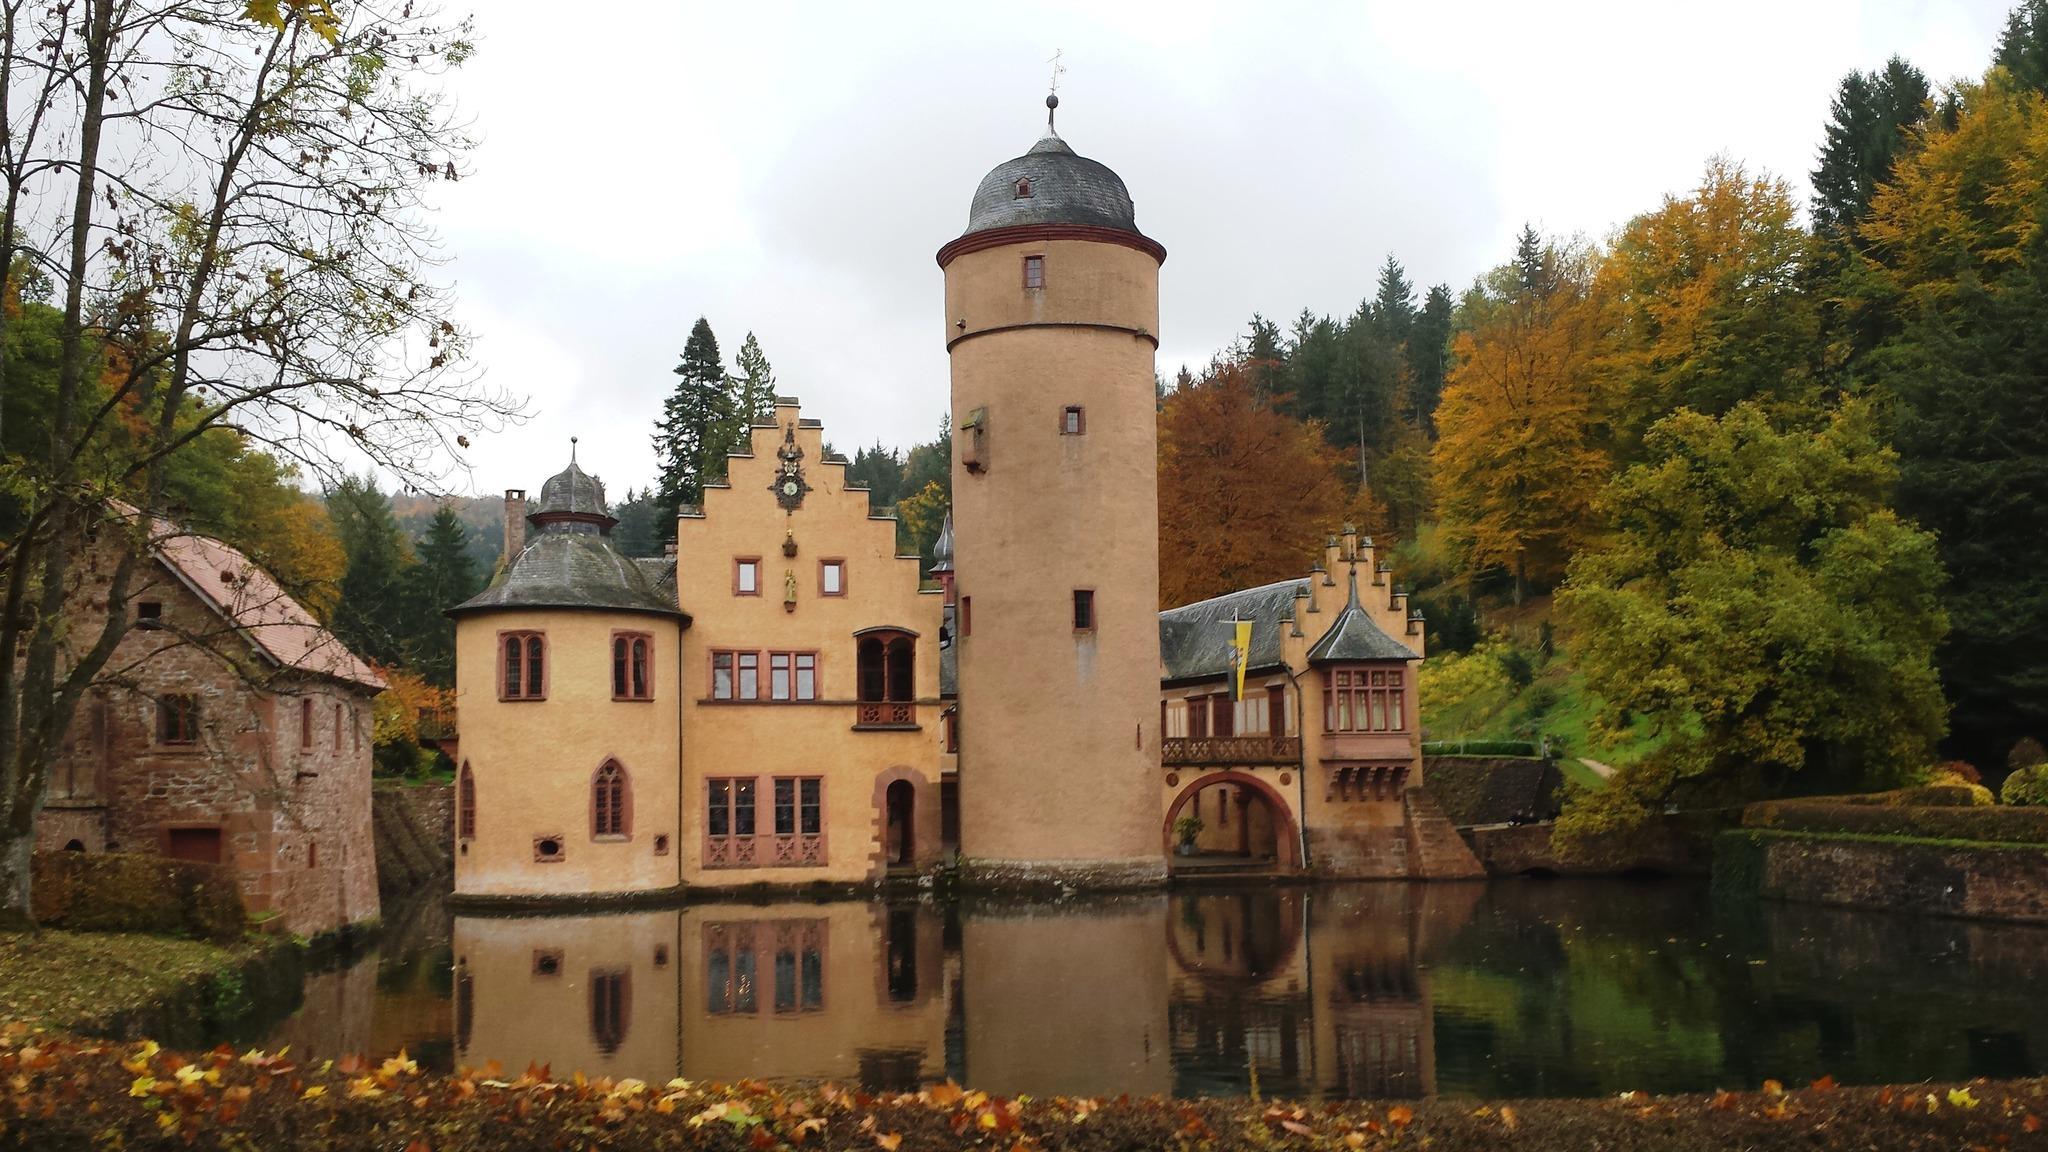 Wirtshaus im spessart bettingen switzerland verwachting waarde bitcoins